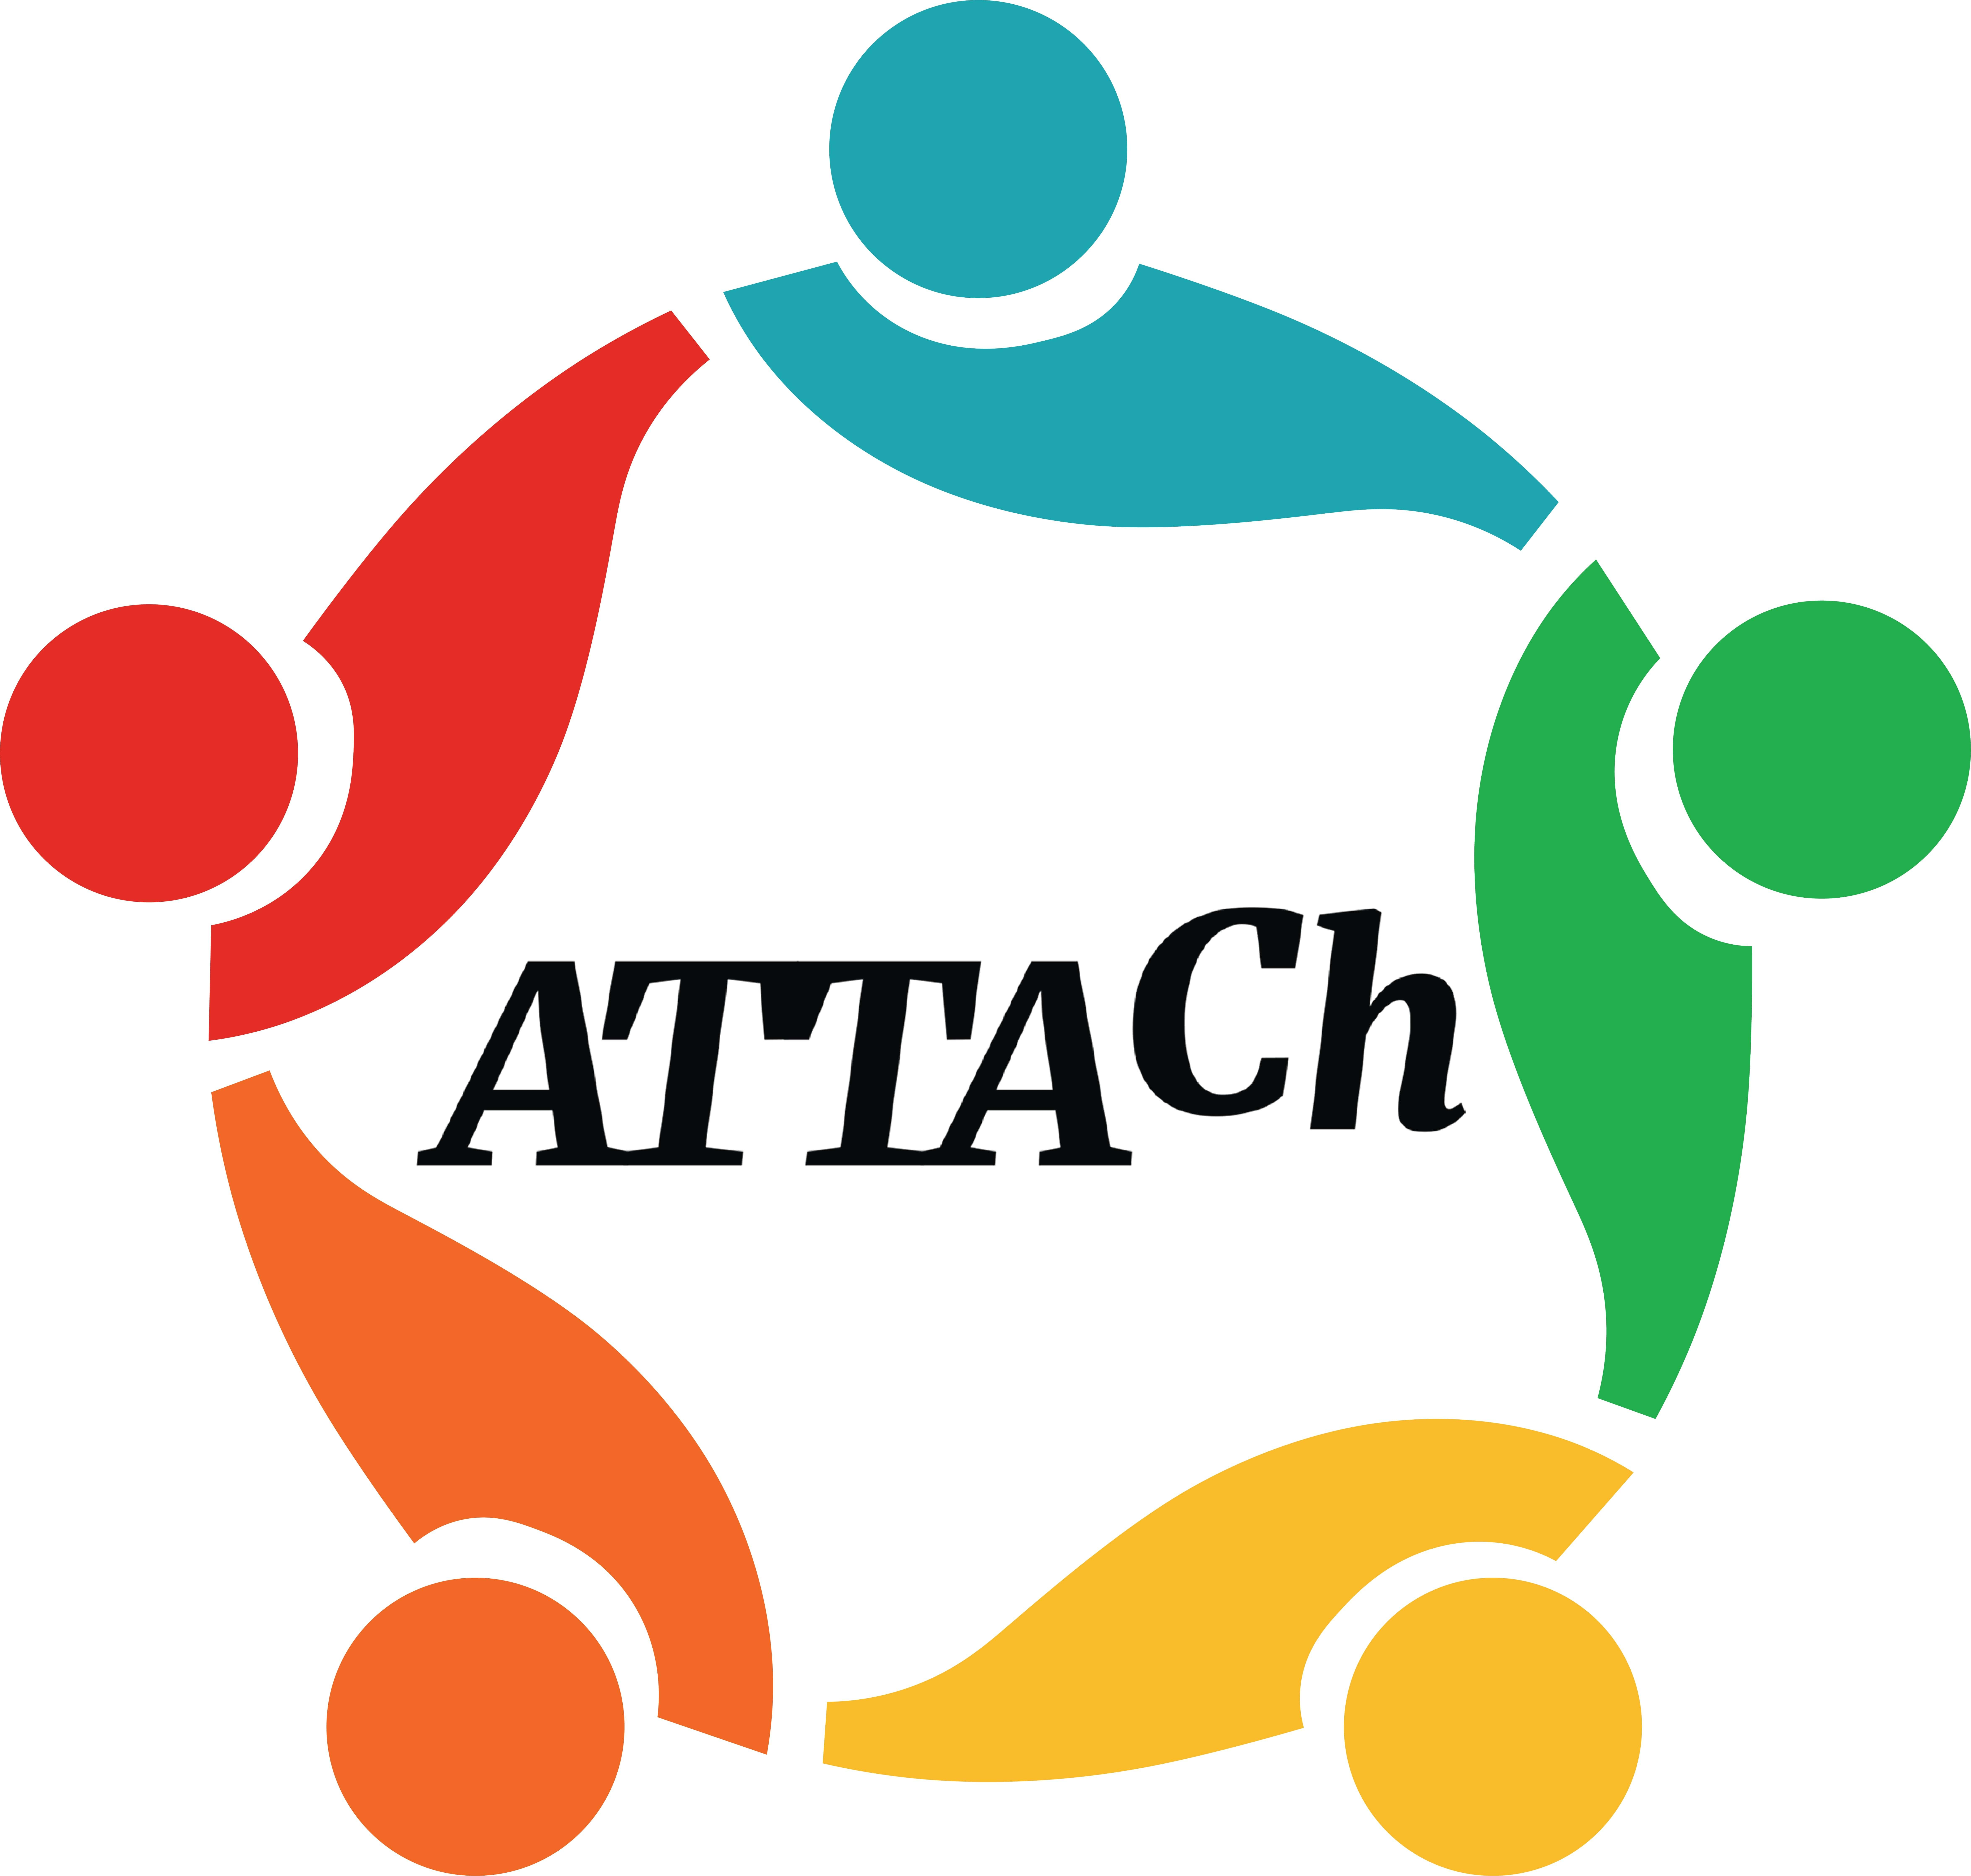 ATTACh logo